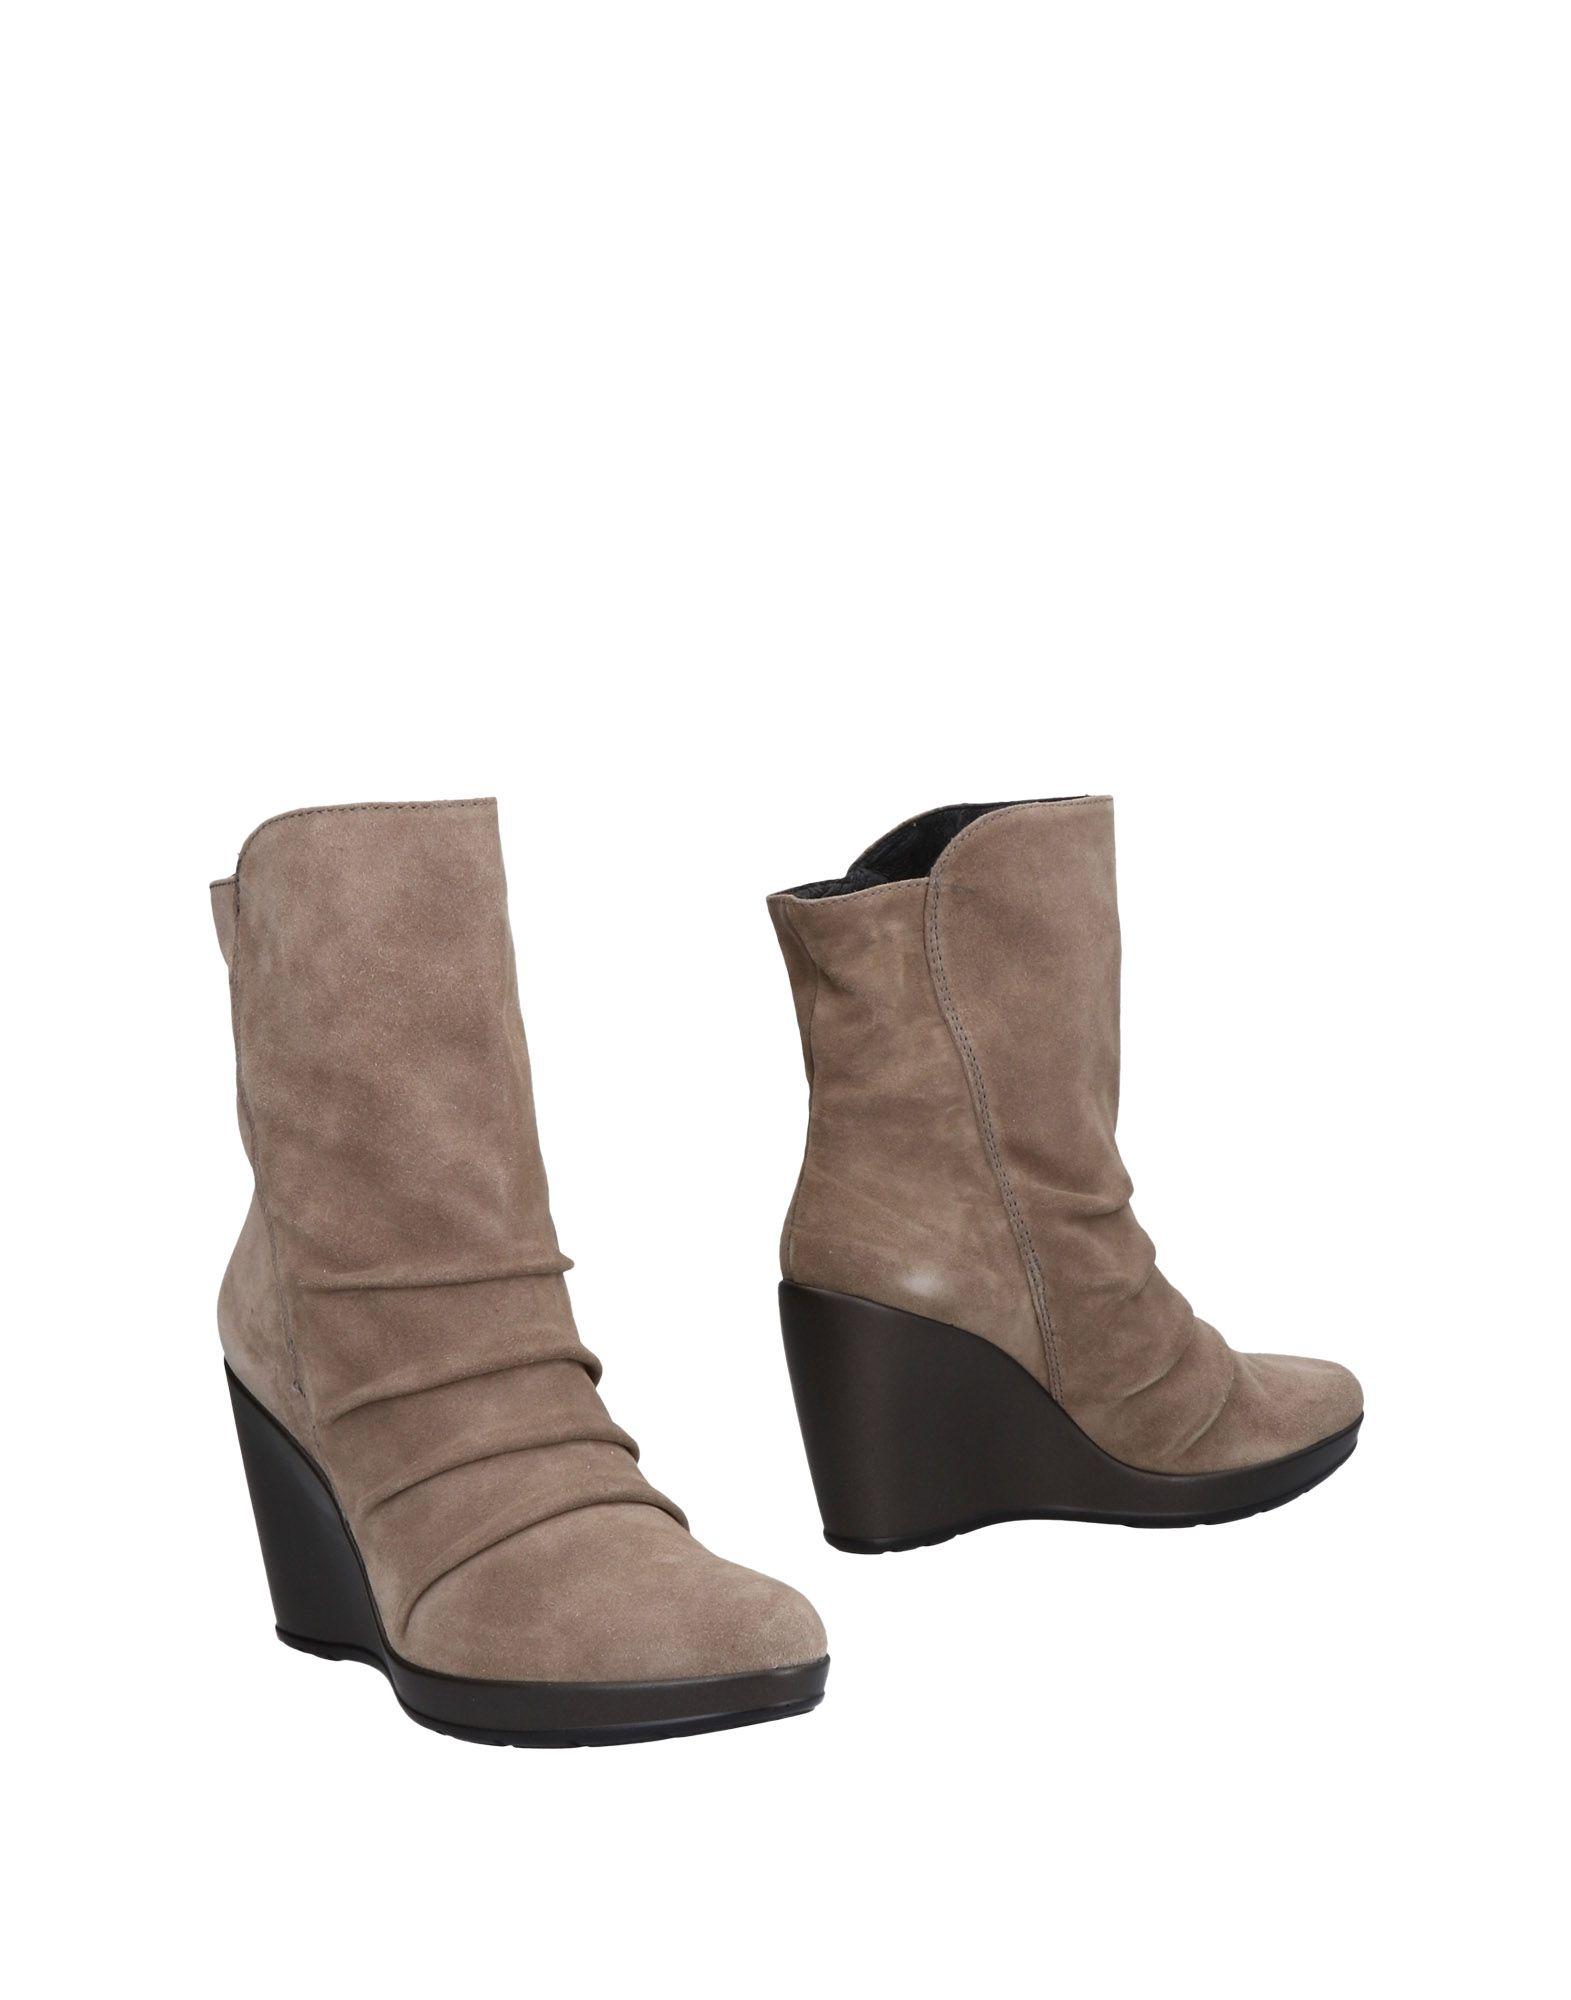 Moda Stivaletti Jeannot Donna - 11466747MB 11466747MB - 151cc1